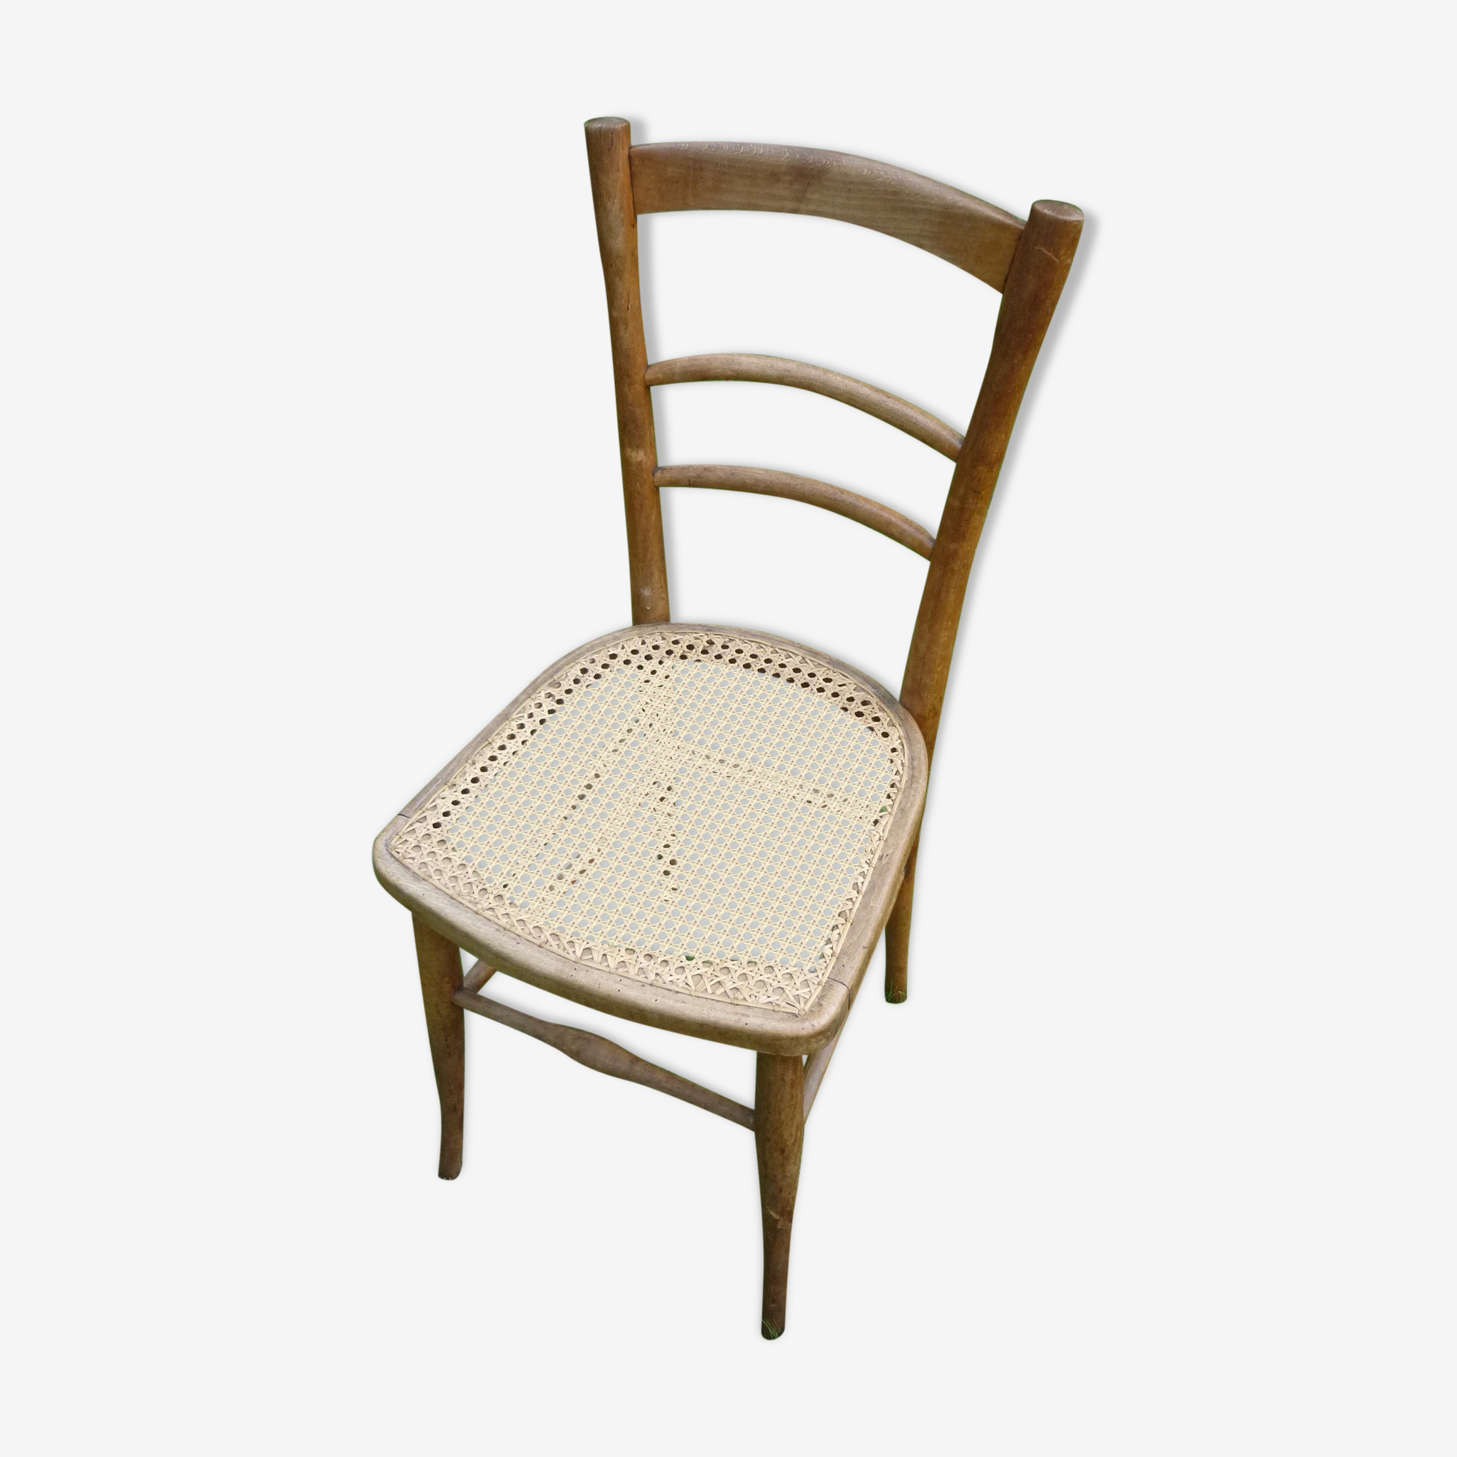 Chaise cannée style bistrot en bois